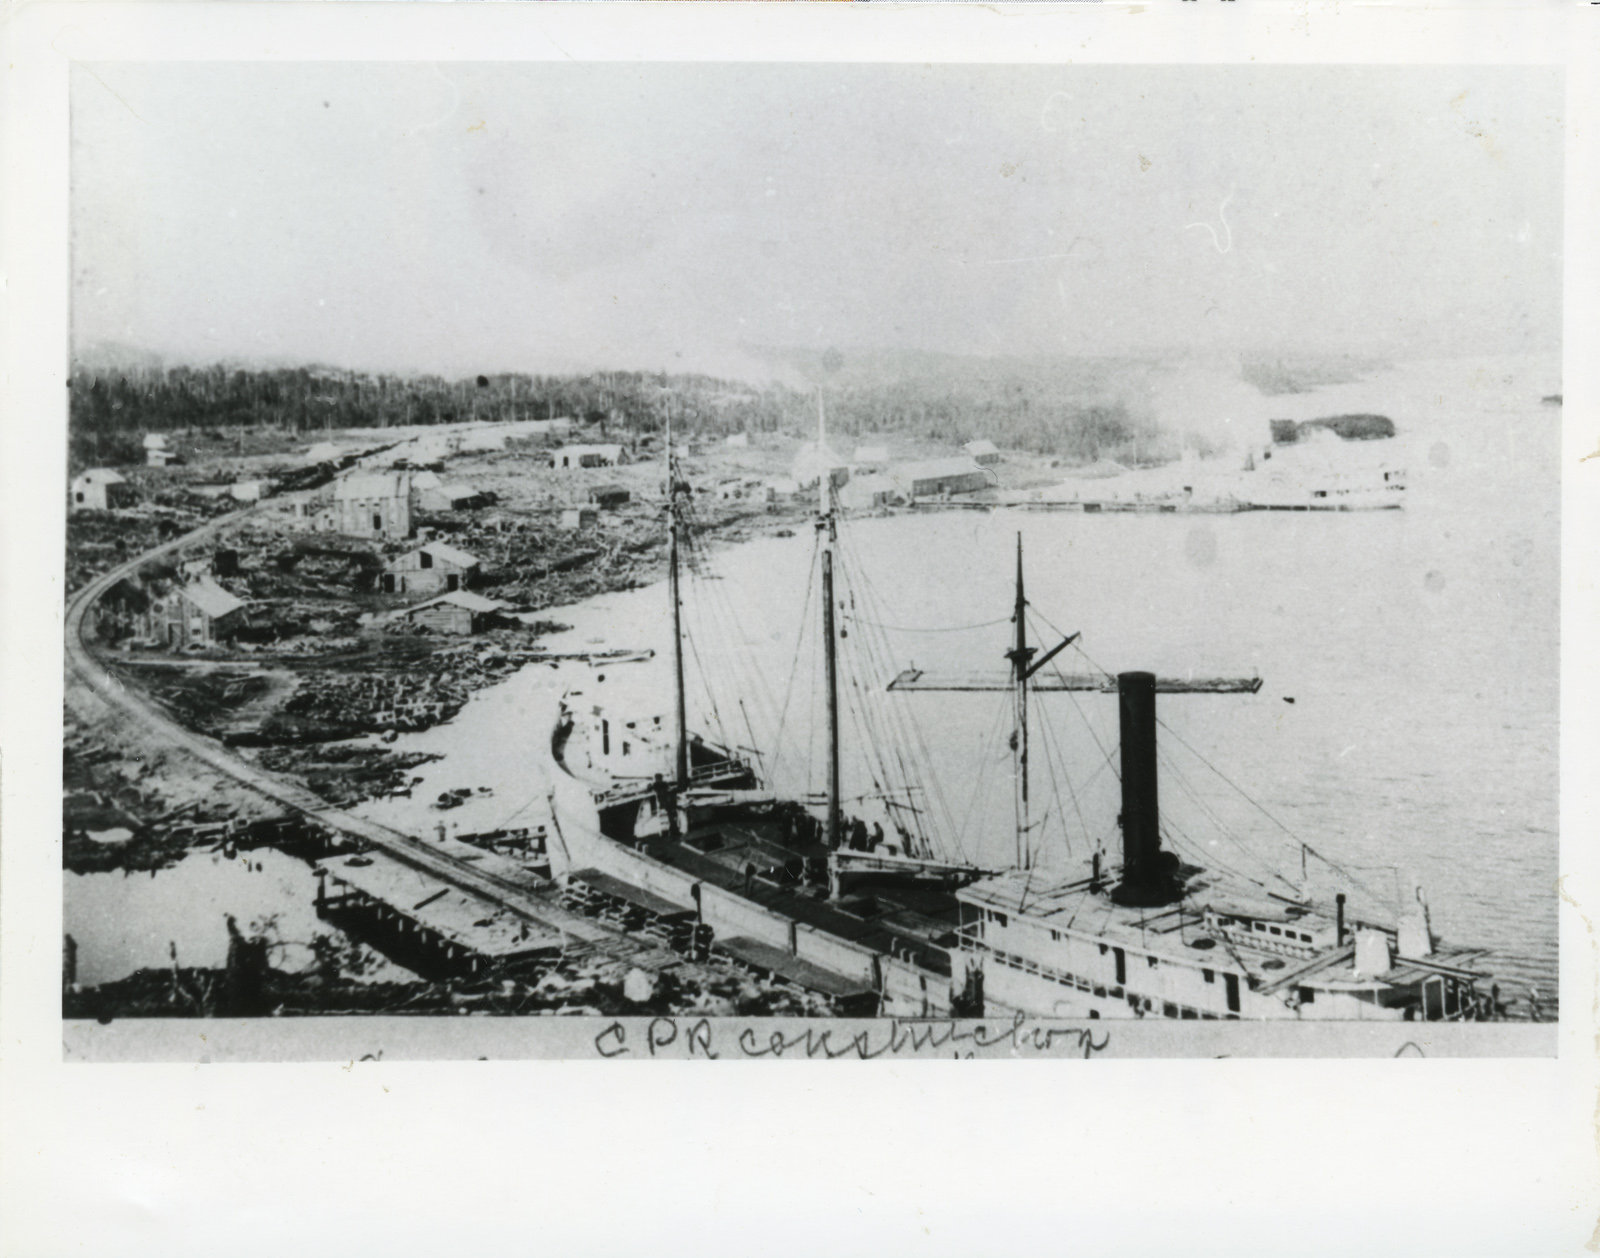 Construction of C.P.R. - McKay's Harbour (Now Rossport)